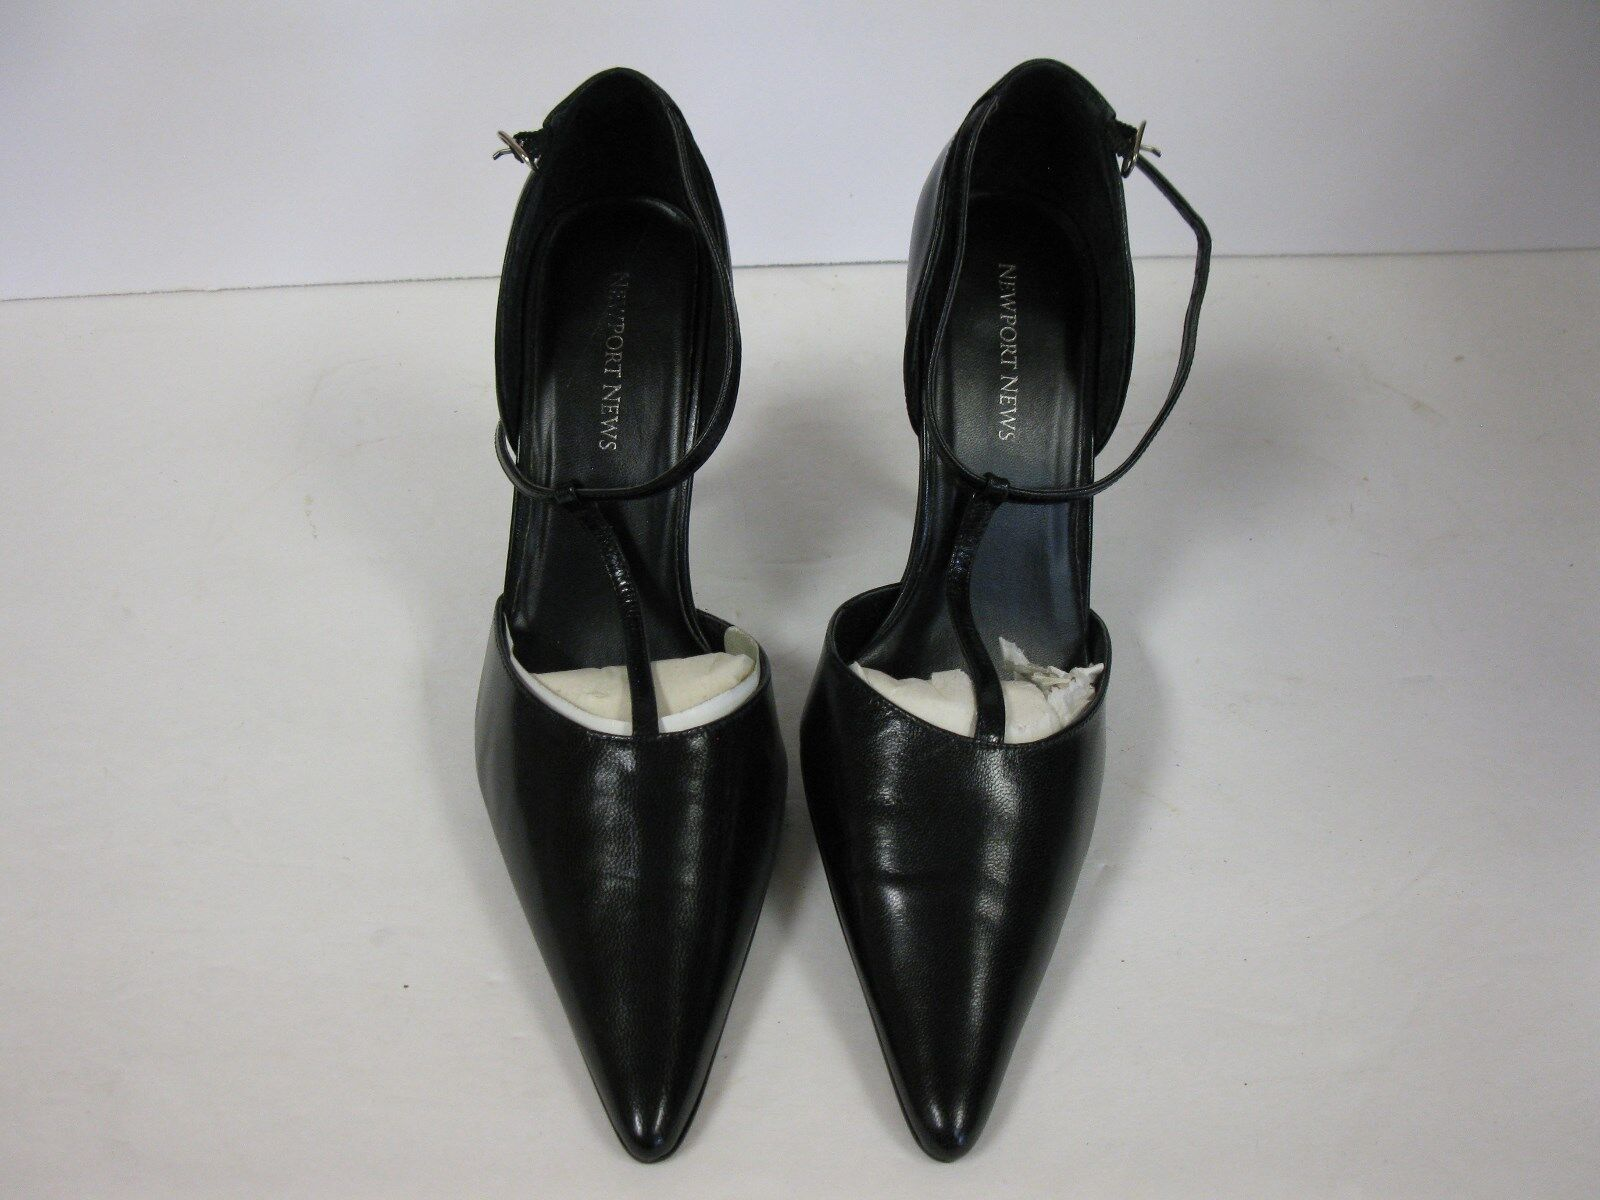 New Newport News Black Pointy Toe Stilettos 9.5M